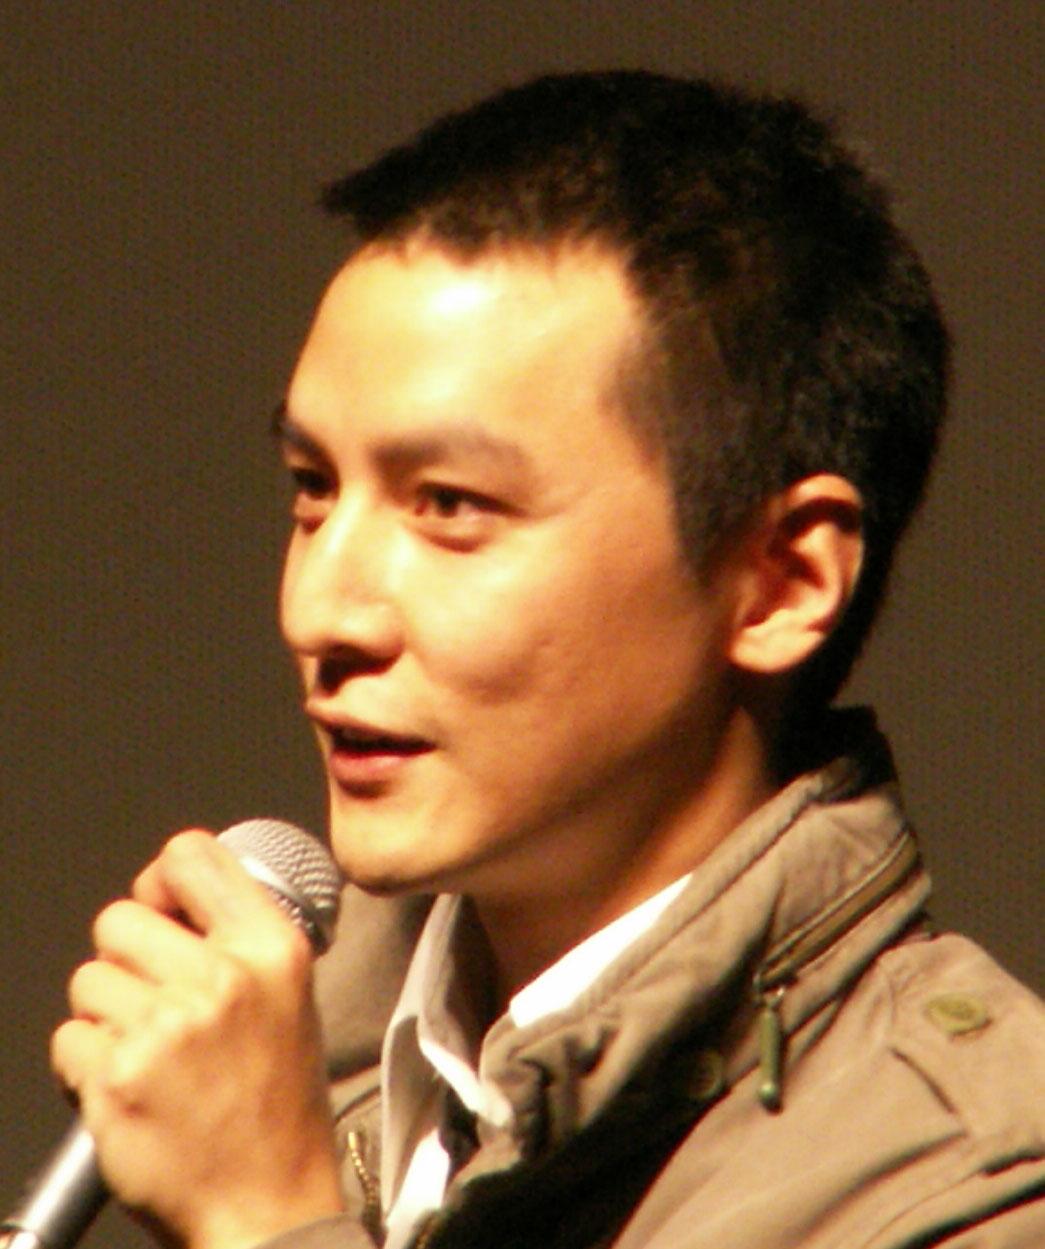 呉彥祖 - Wikipedia